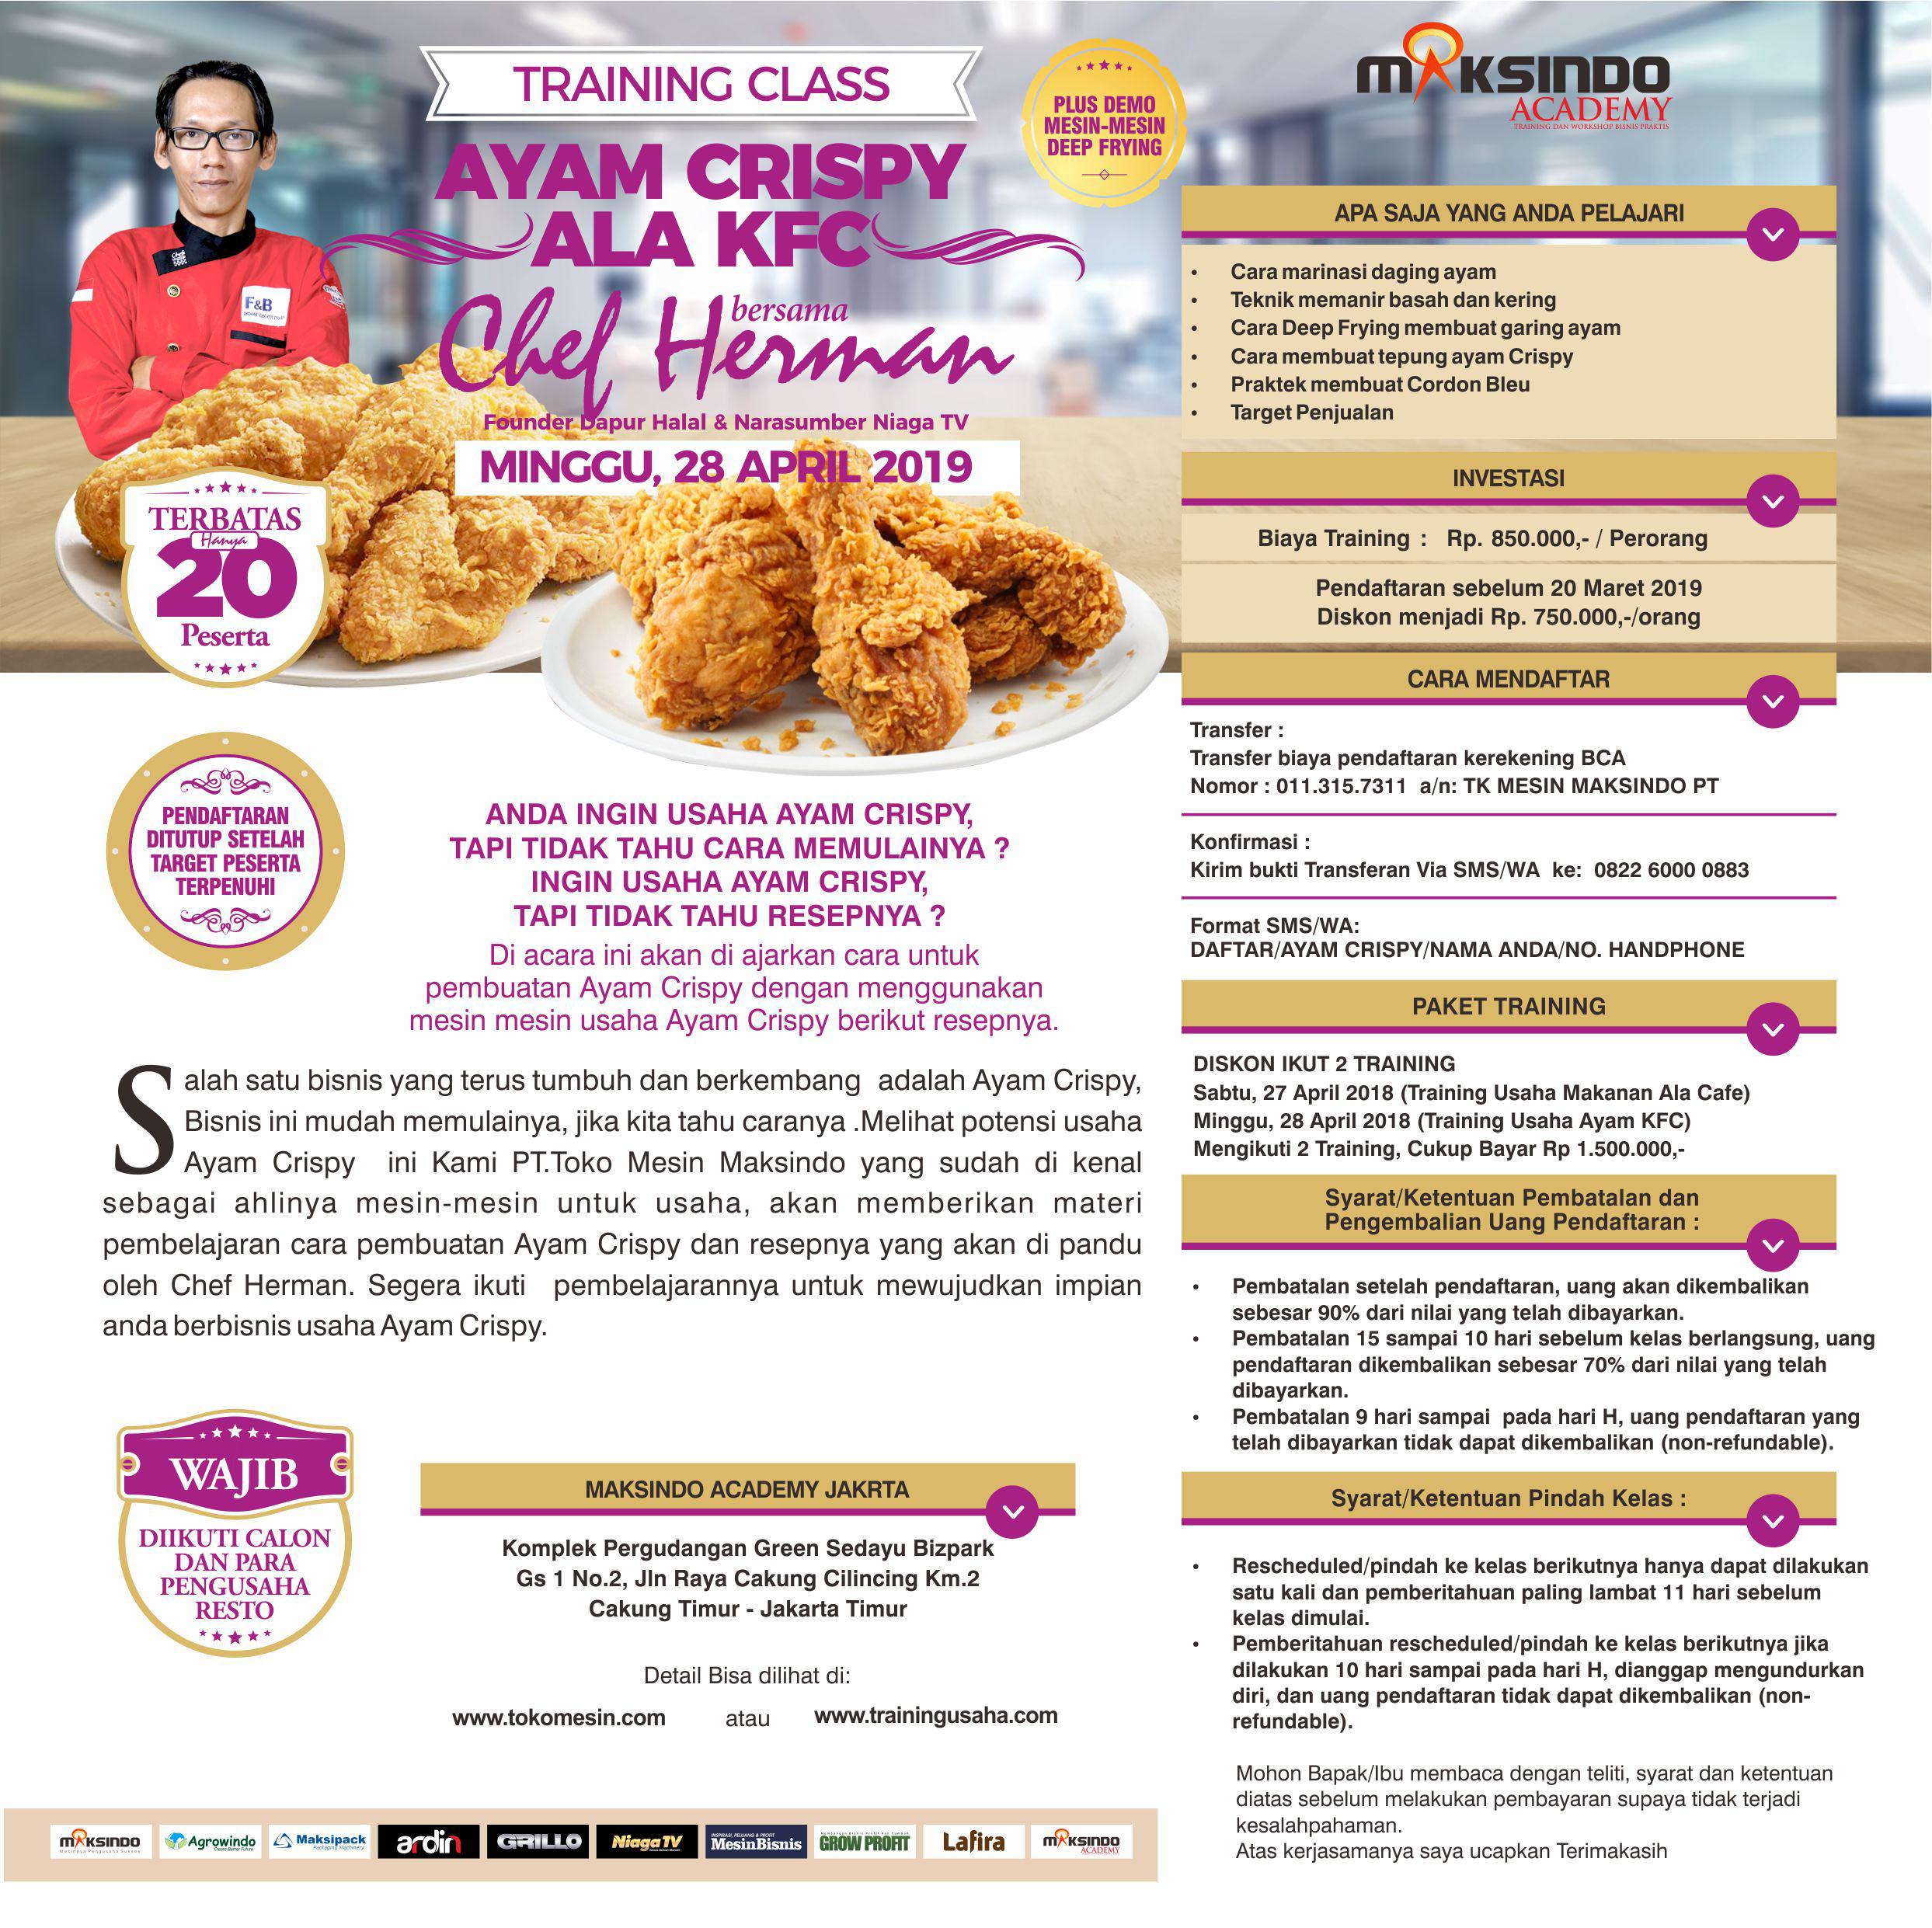 Training Class Ayam Crispy Ala KFC, Sabtu 28 April 2019